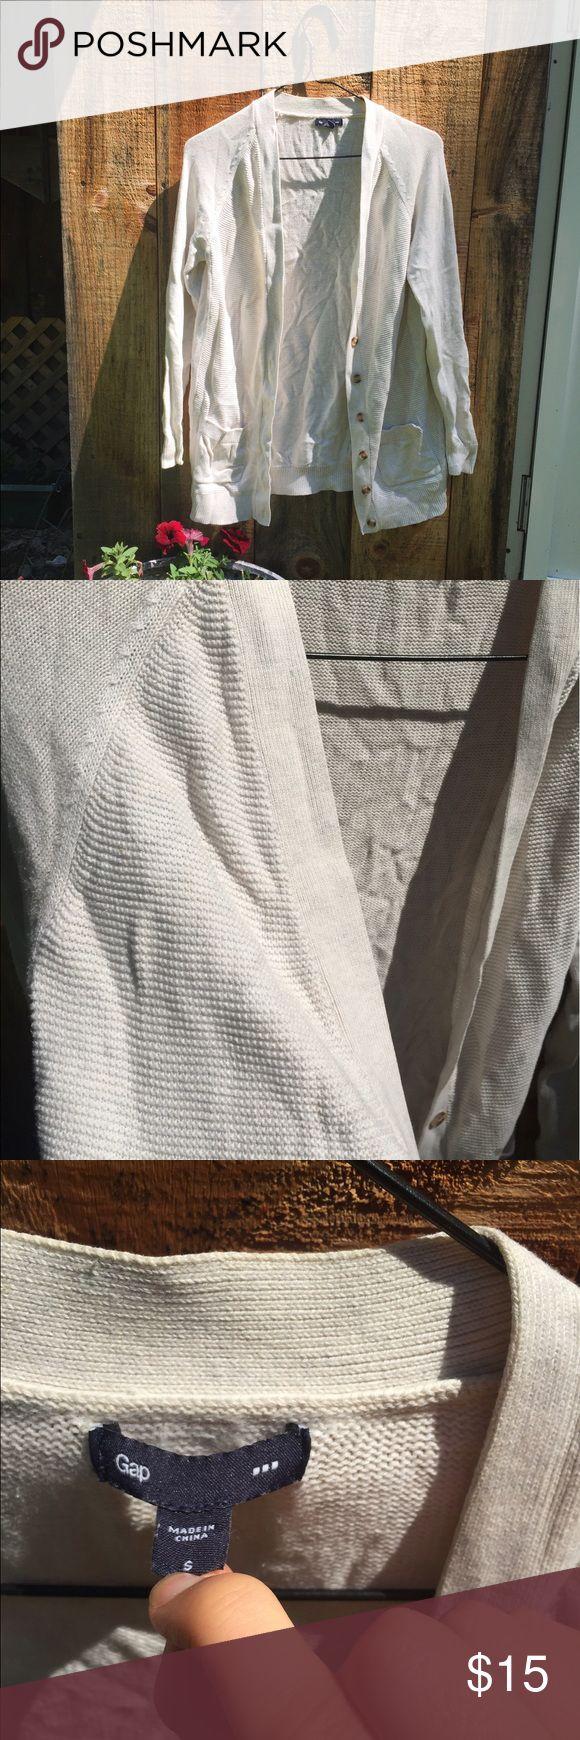 Gap Cardigan Cozy gap sweater that is a bit frayed on one pocket. GAP Sweaters Cardigans